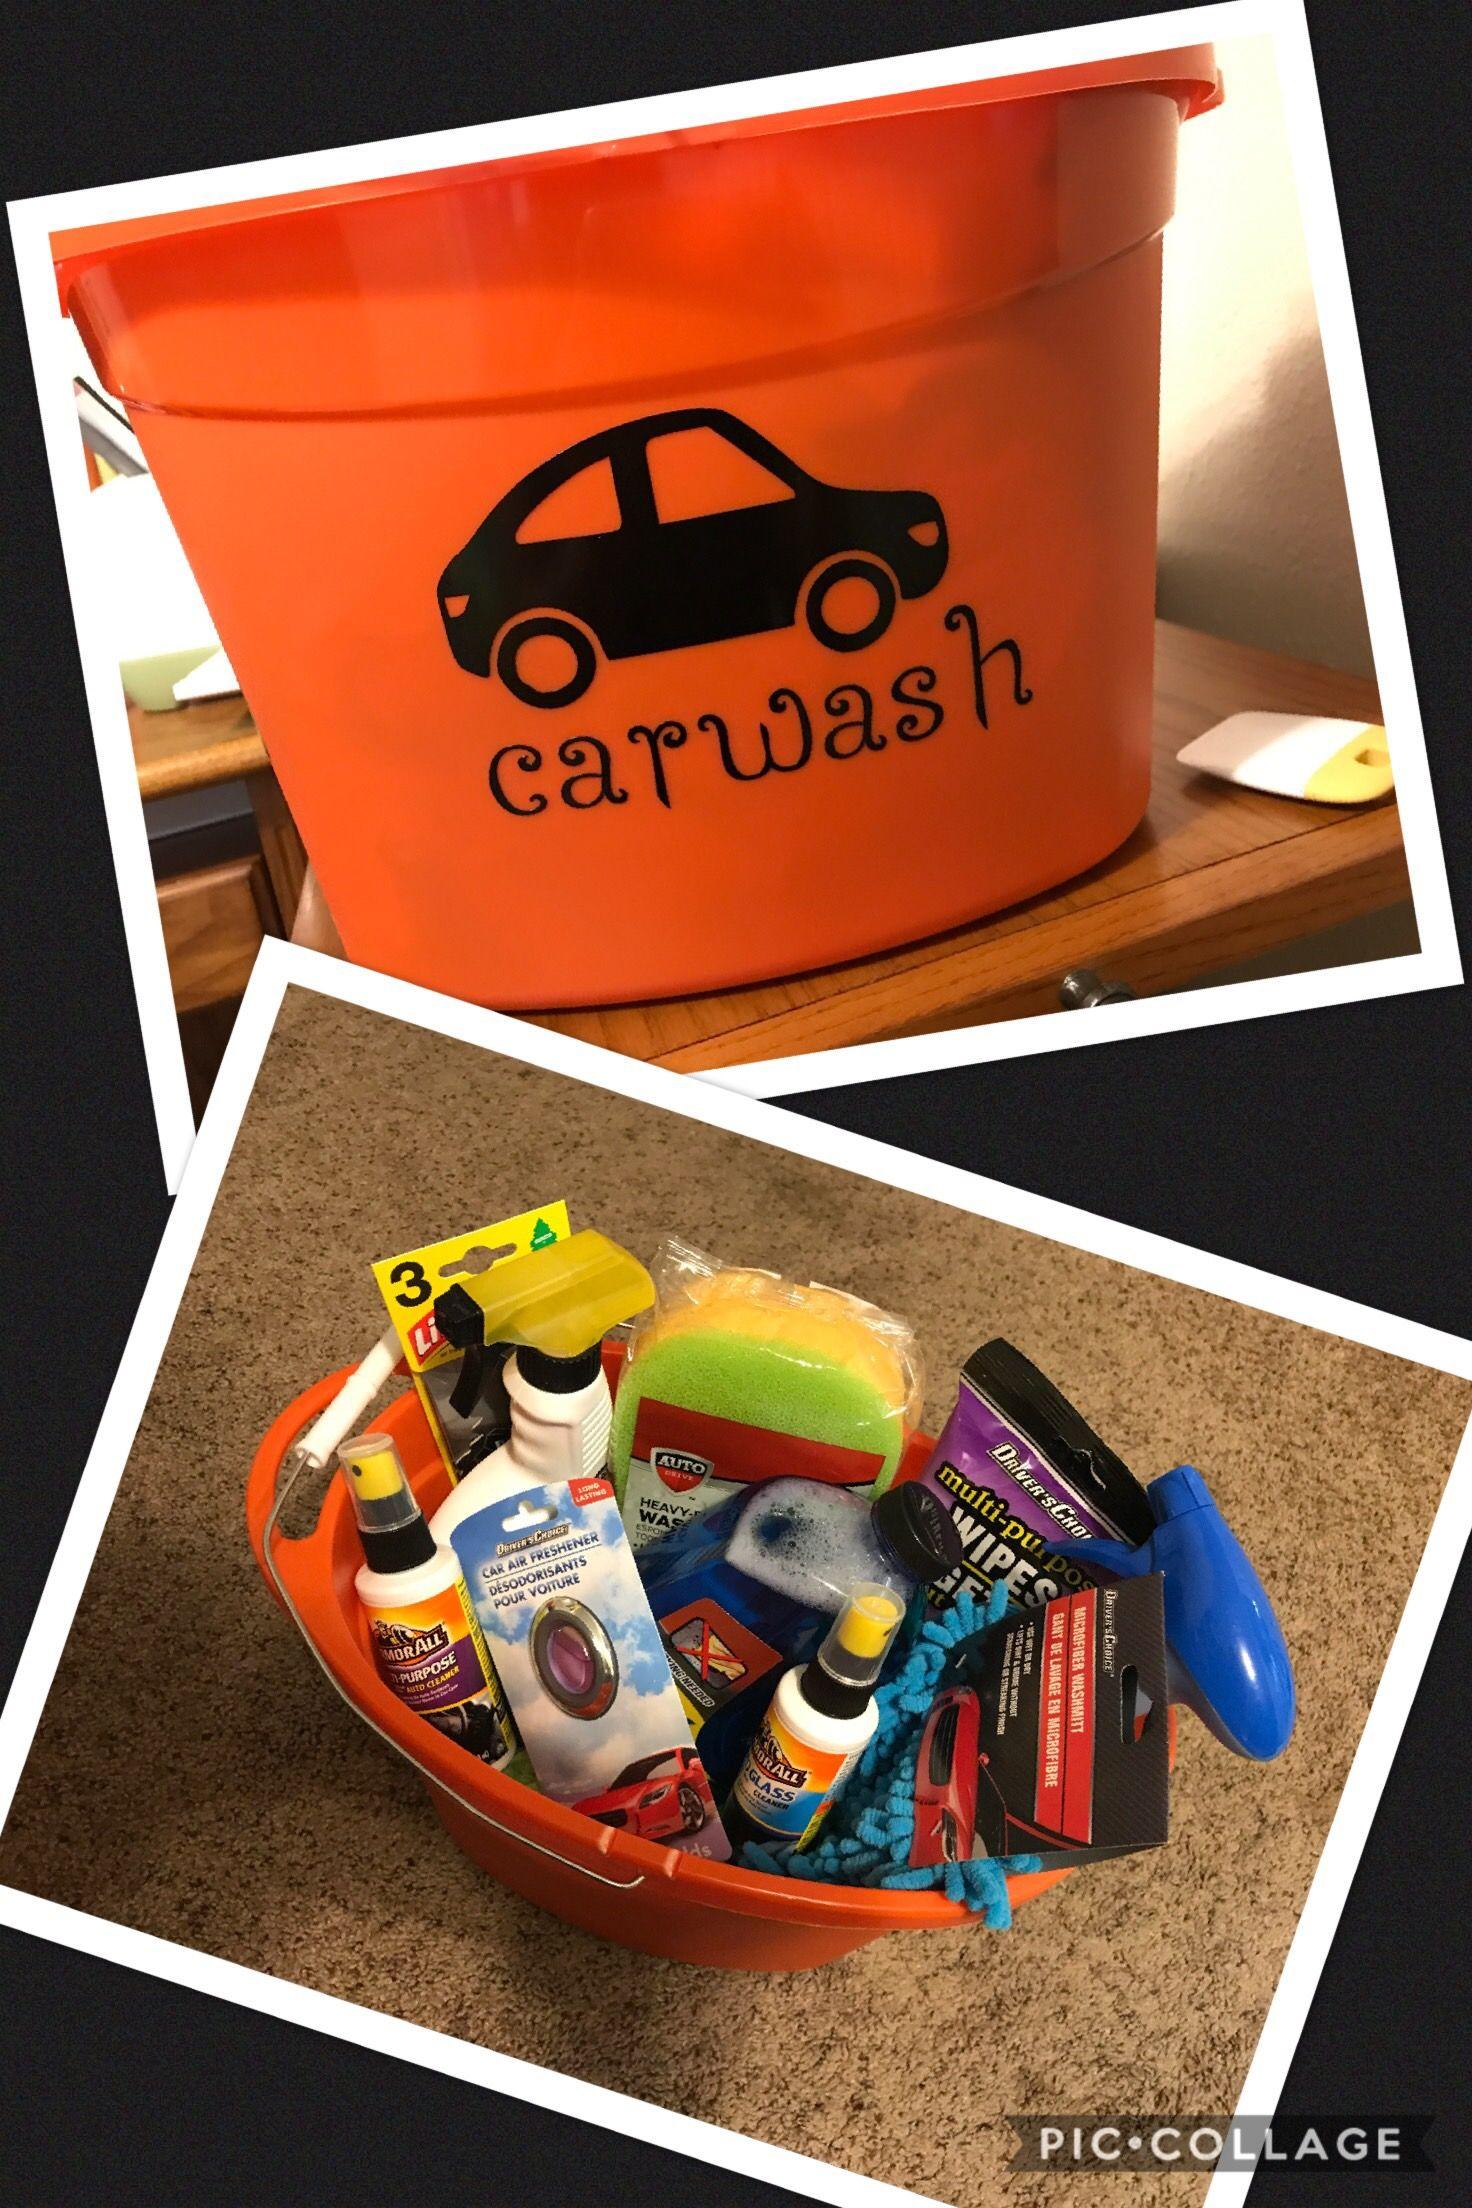 Car wash gift basket 16th birthday gifts, Car gift